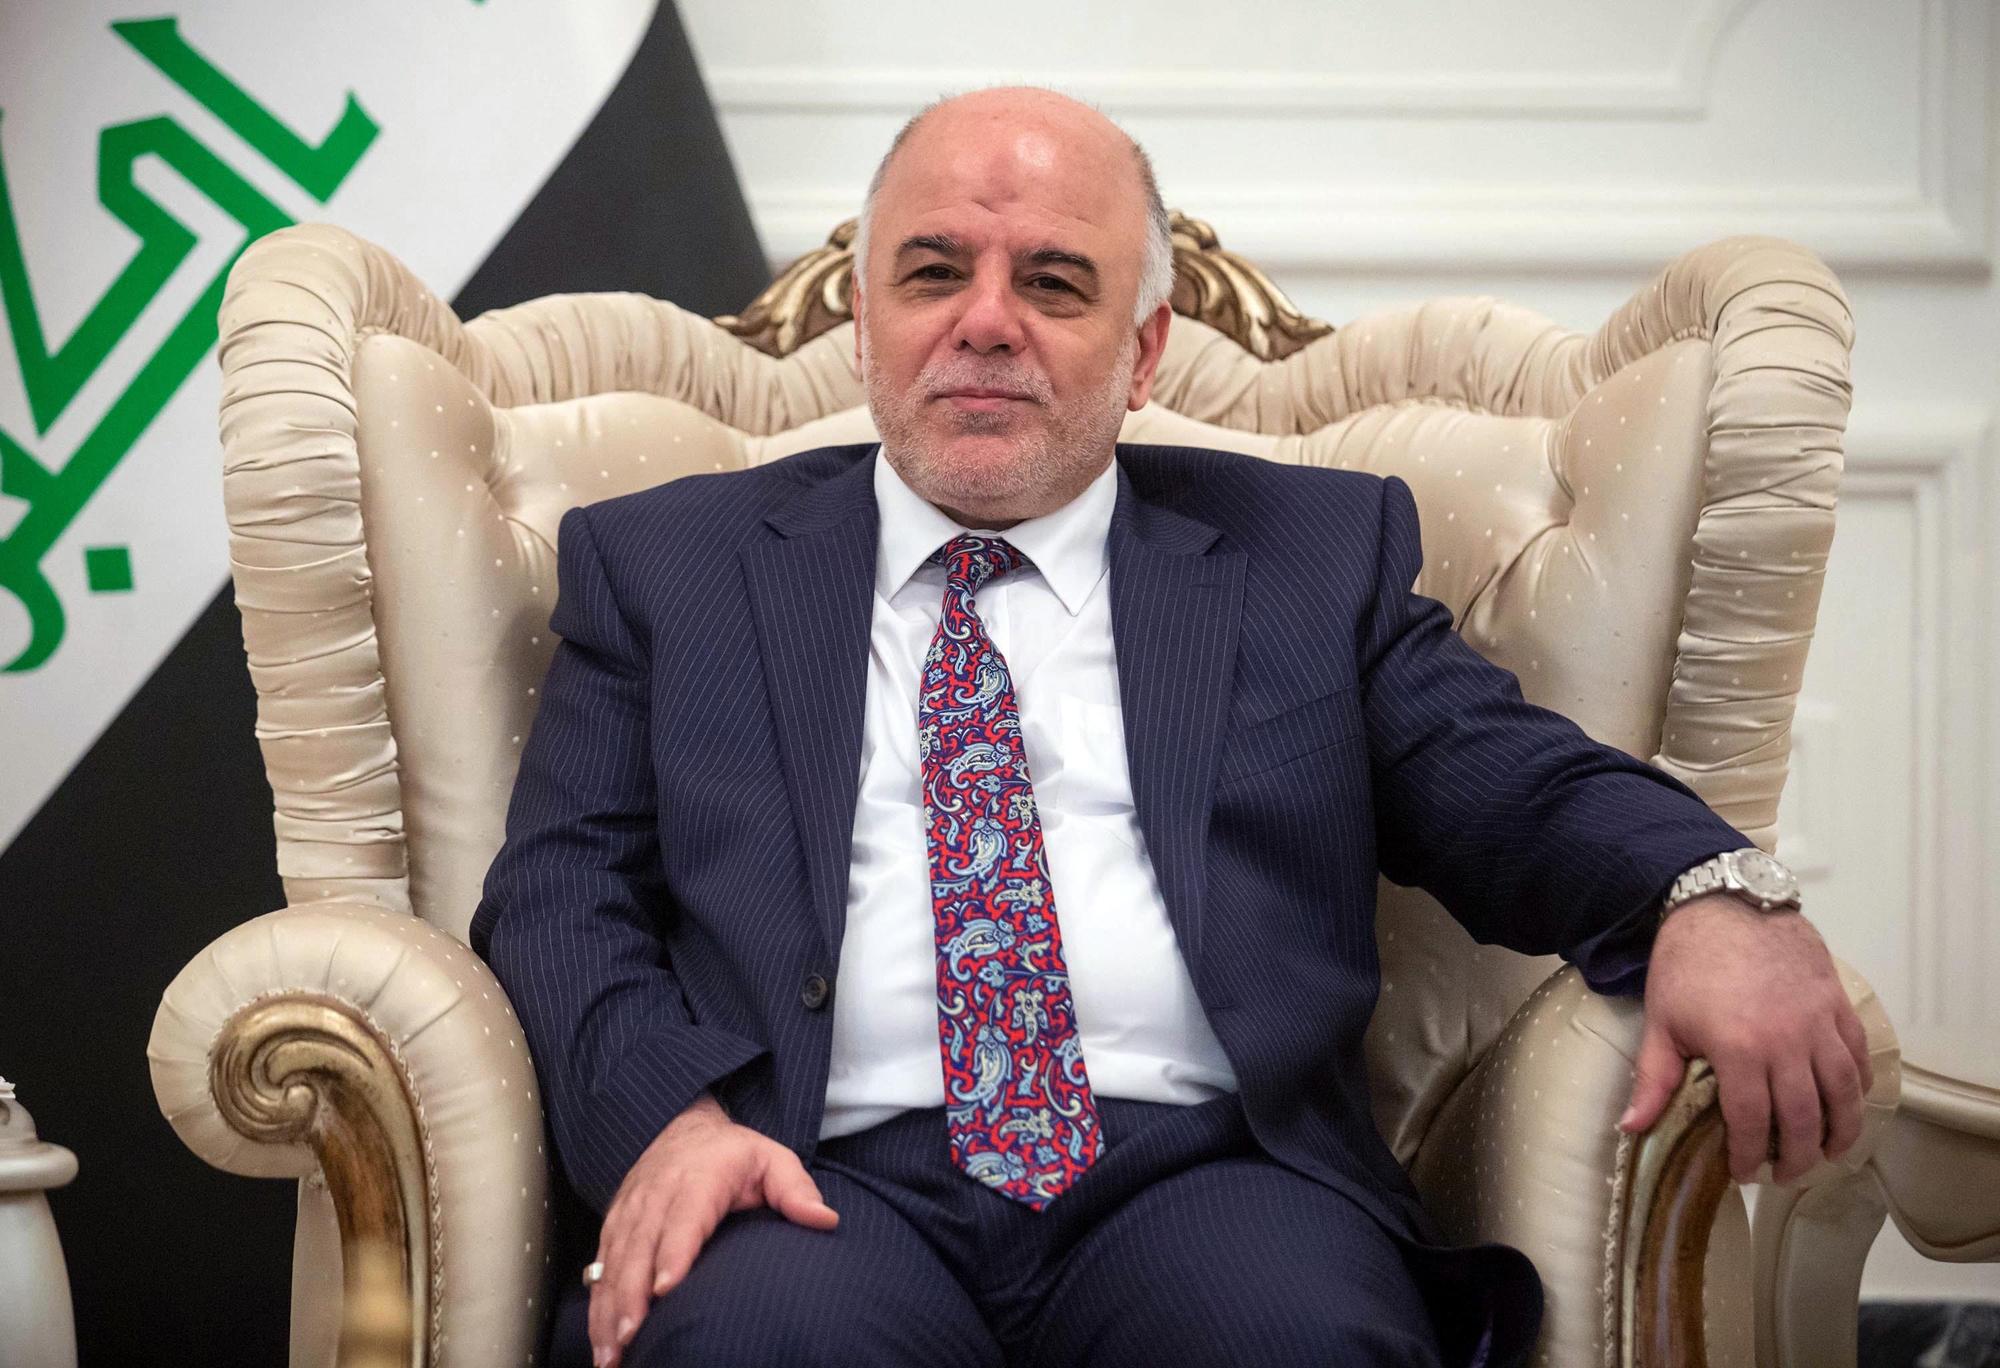 Iraq's new prime minister Haidar Al-Abadi in Bagdad, Aug. 16, 2014.